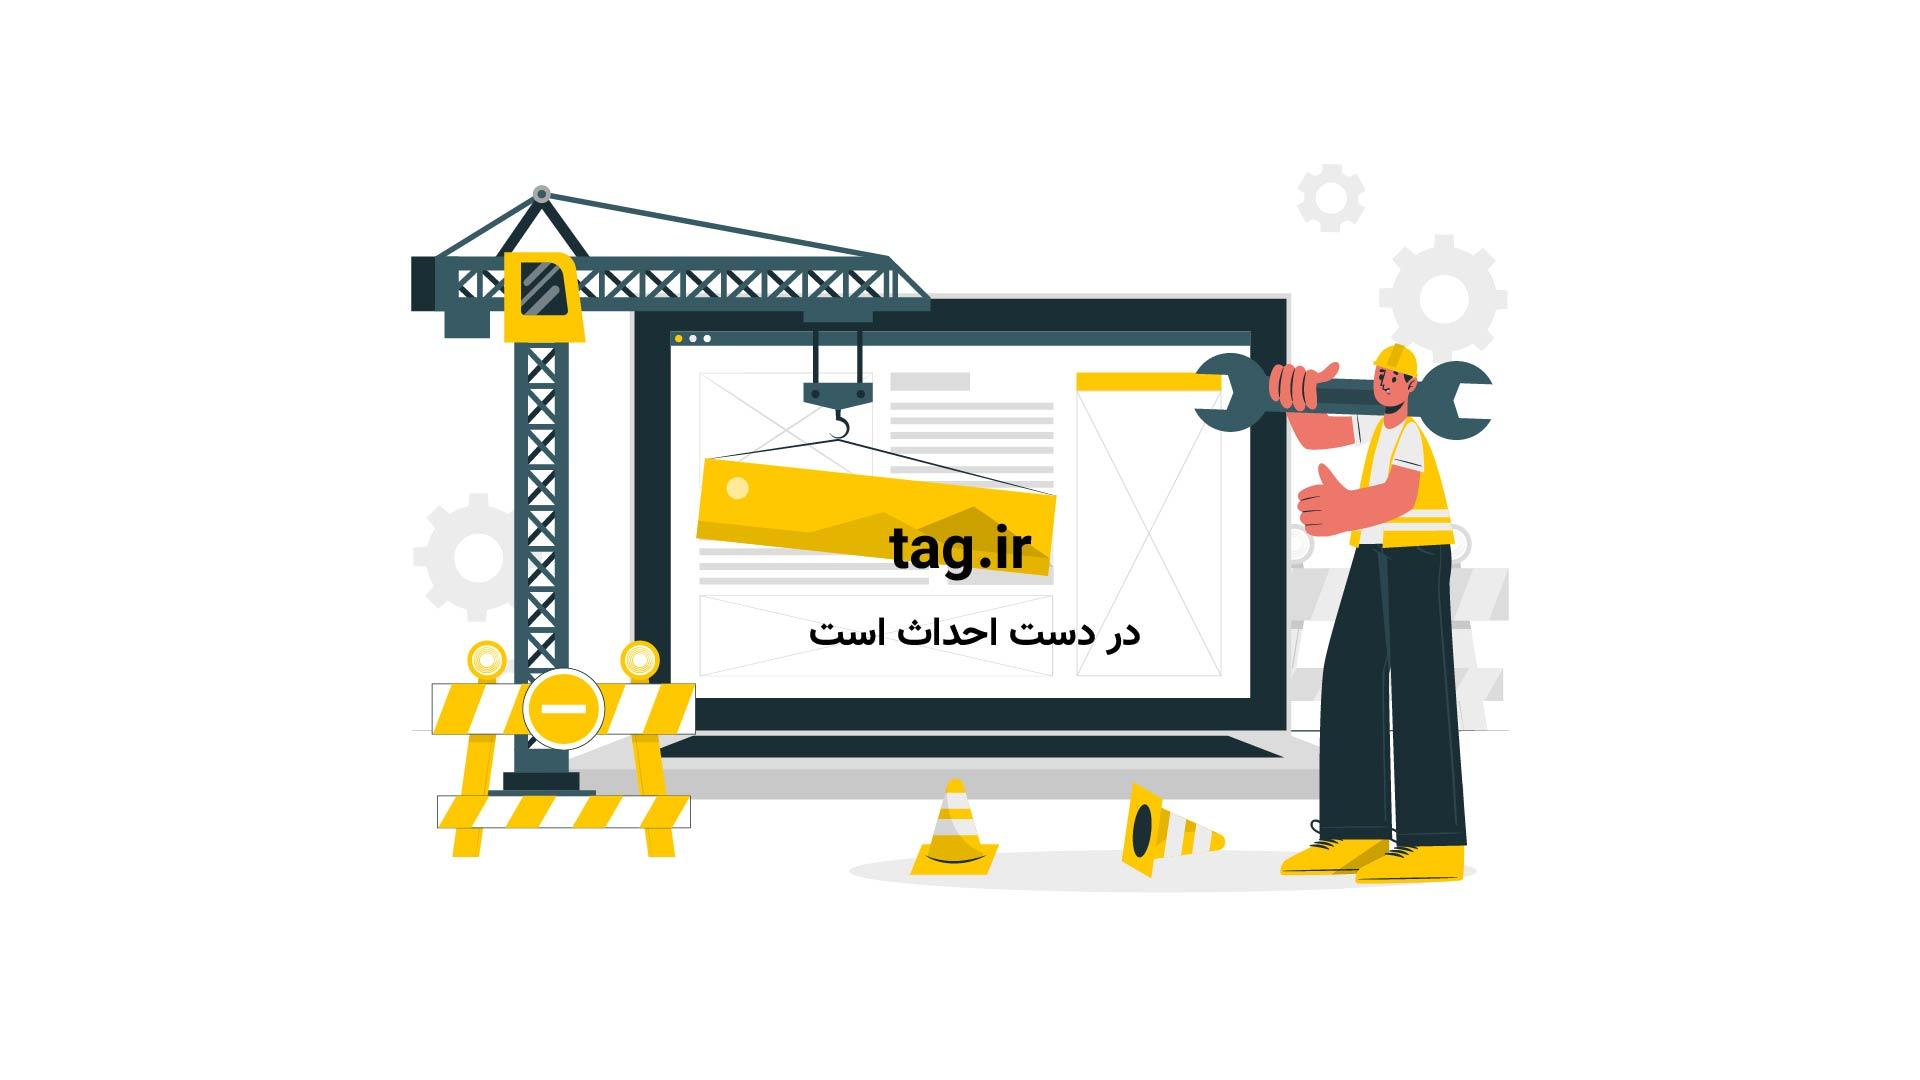 دهه فجر انقلاب اسلامی | تگ